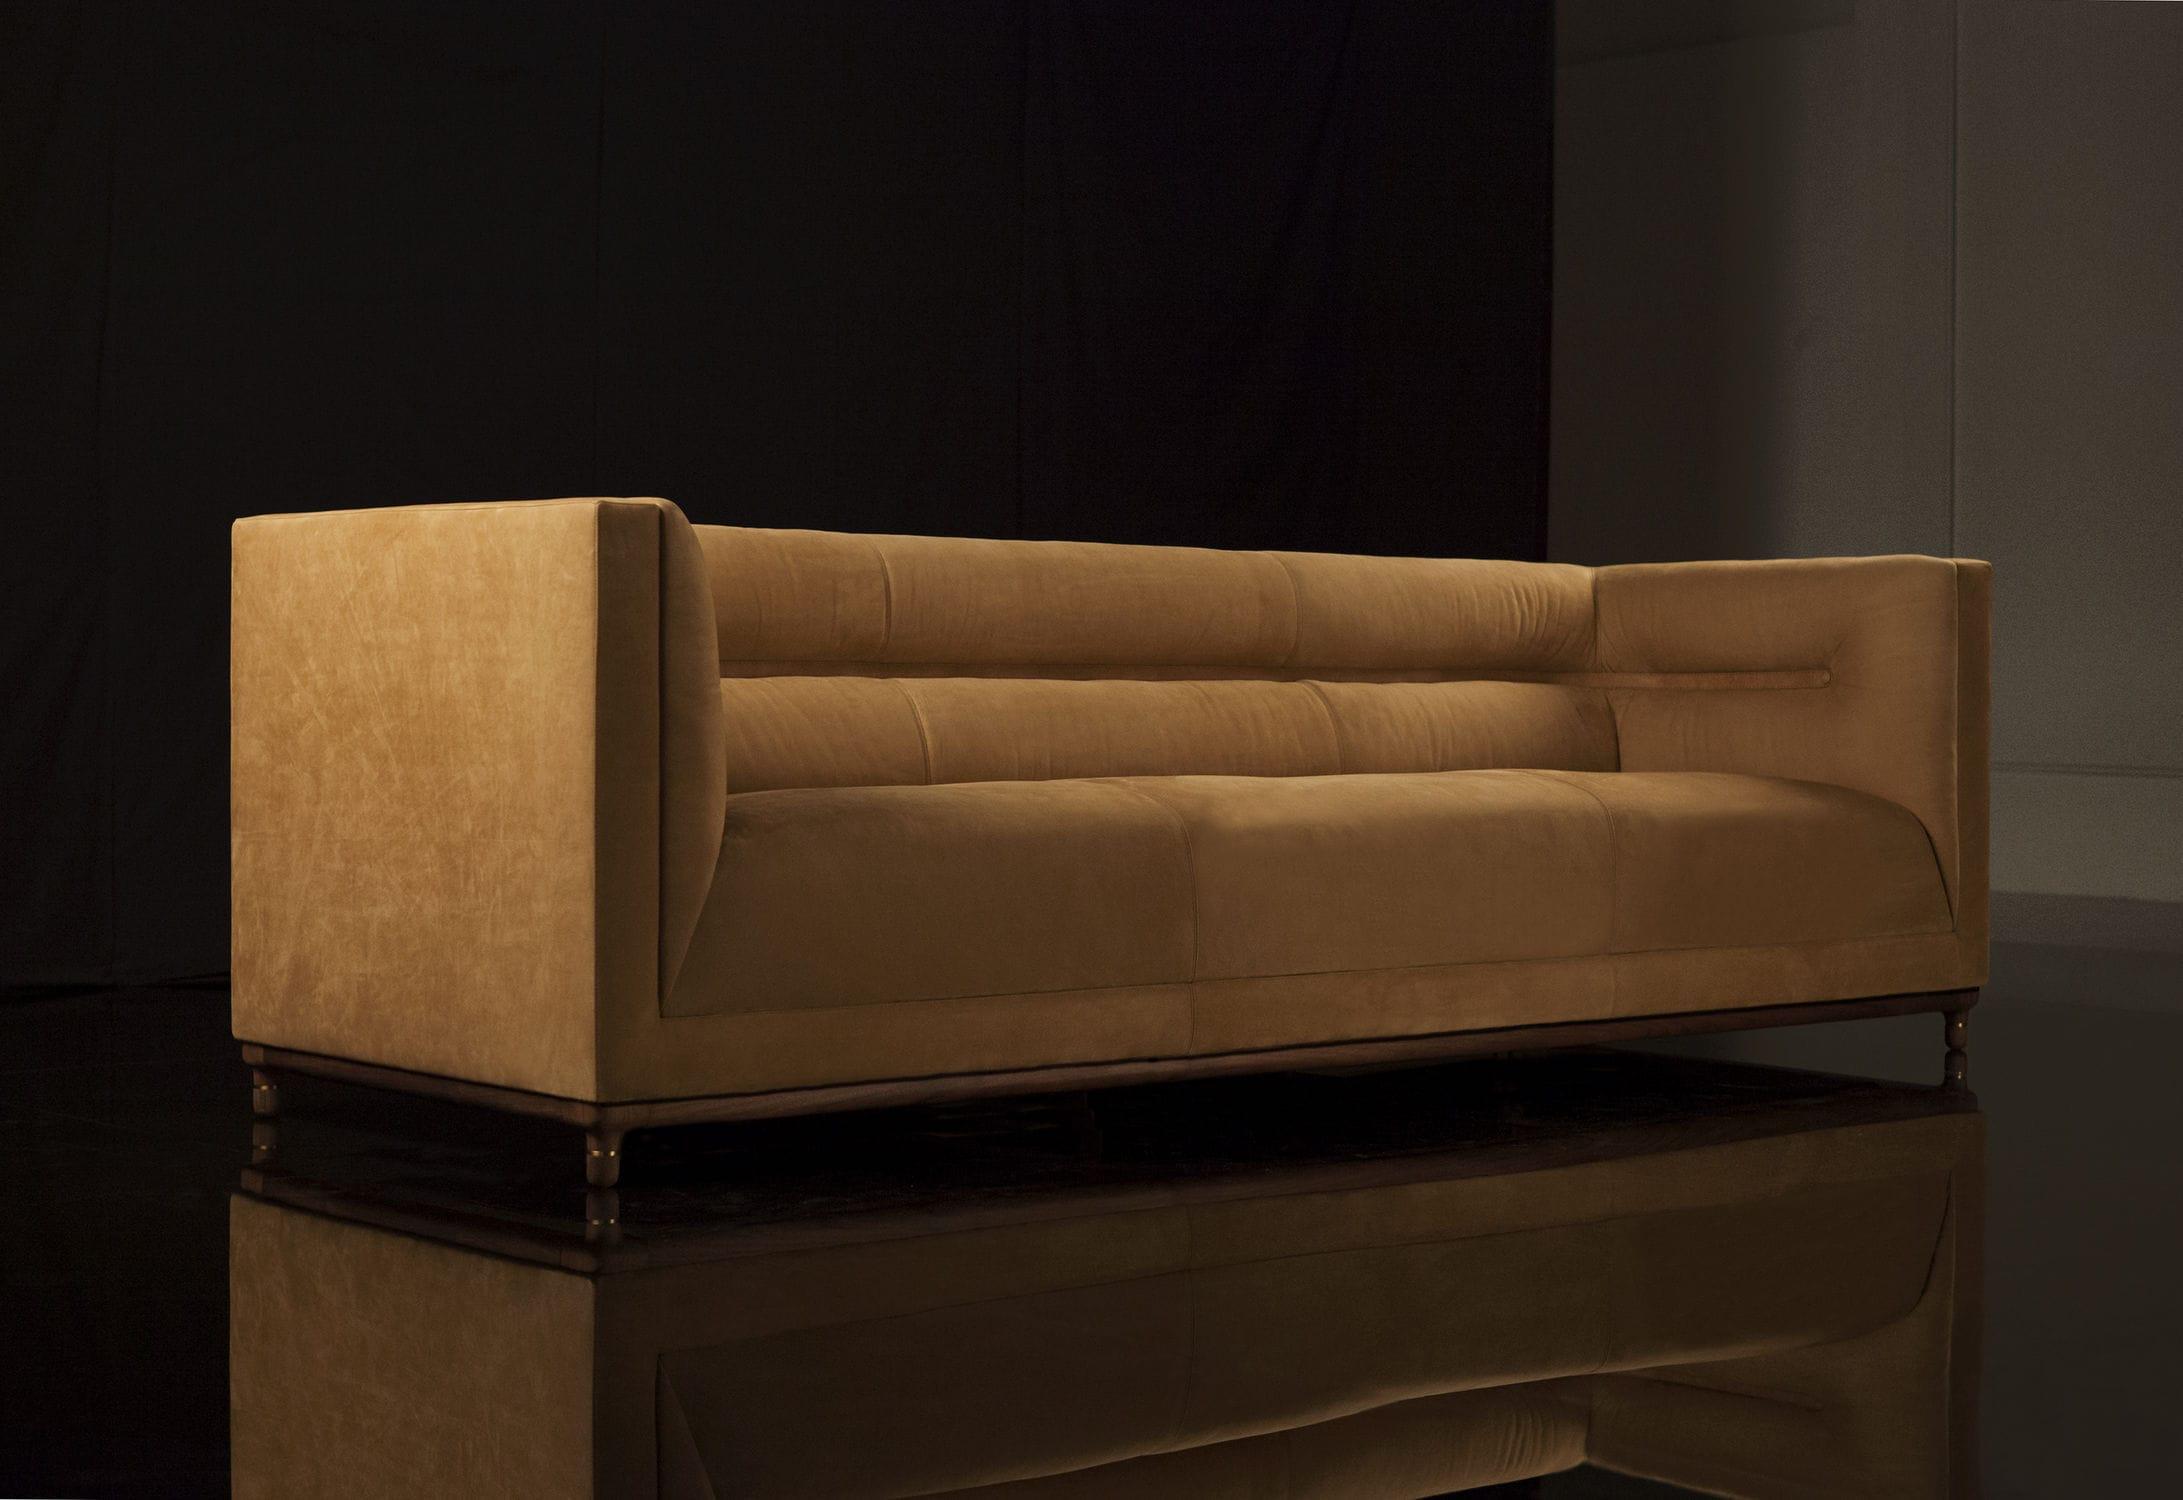 Contemporary sofa fabric 3 seater ALEX by Jephson Robb